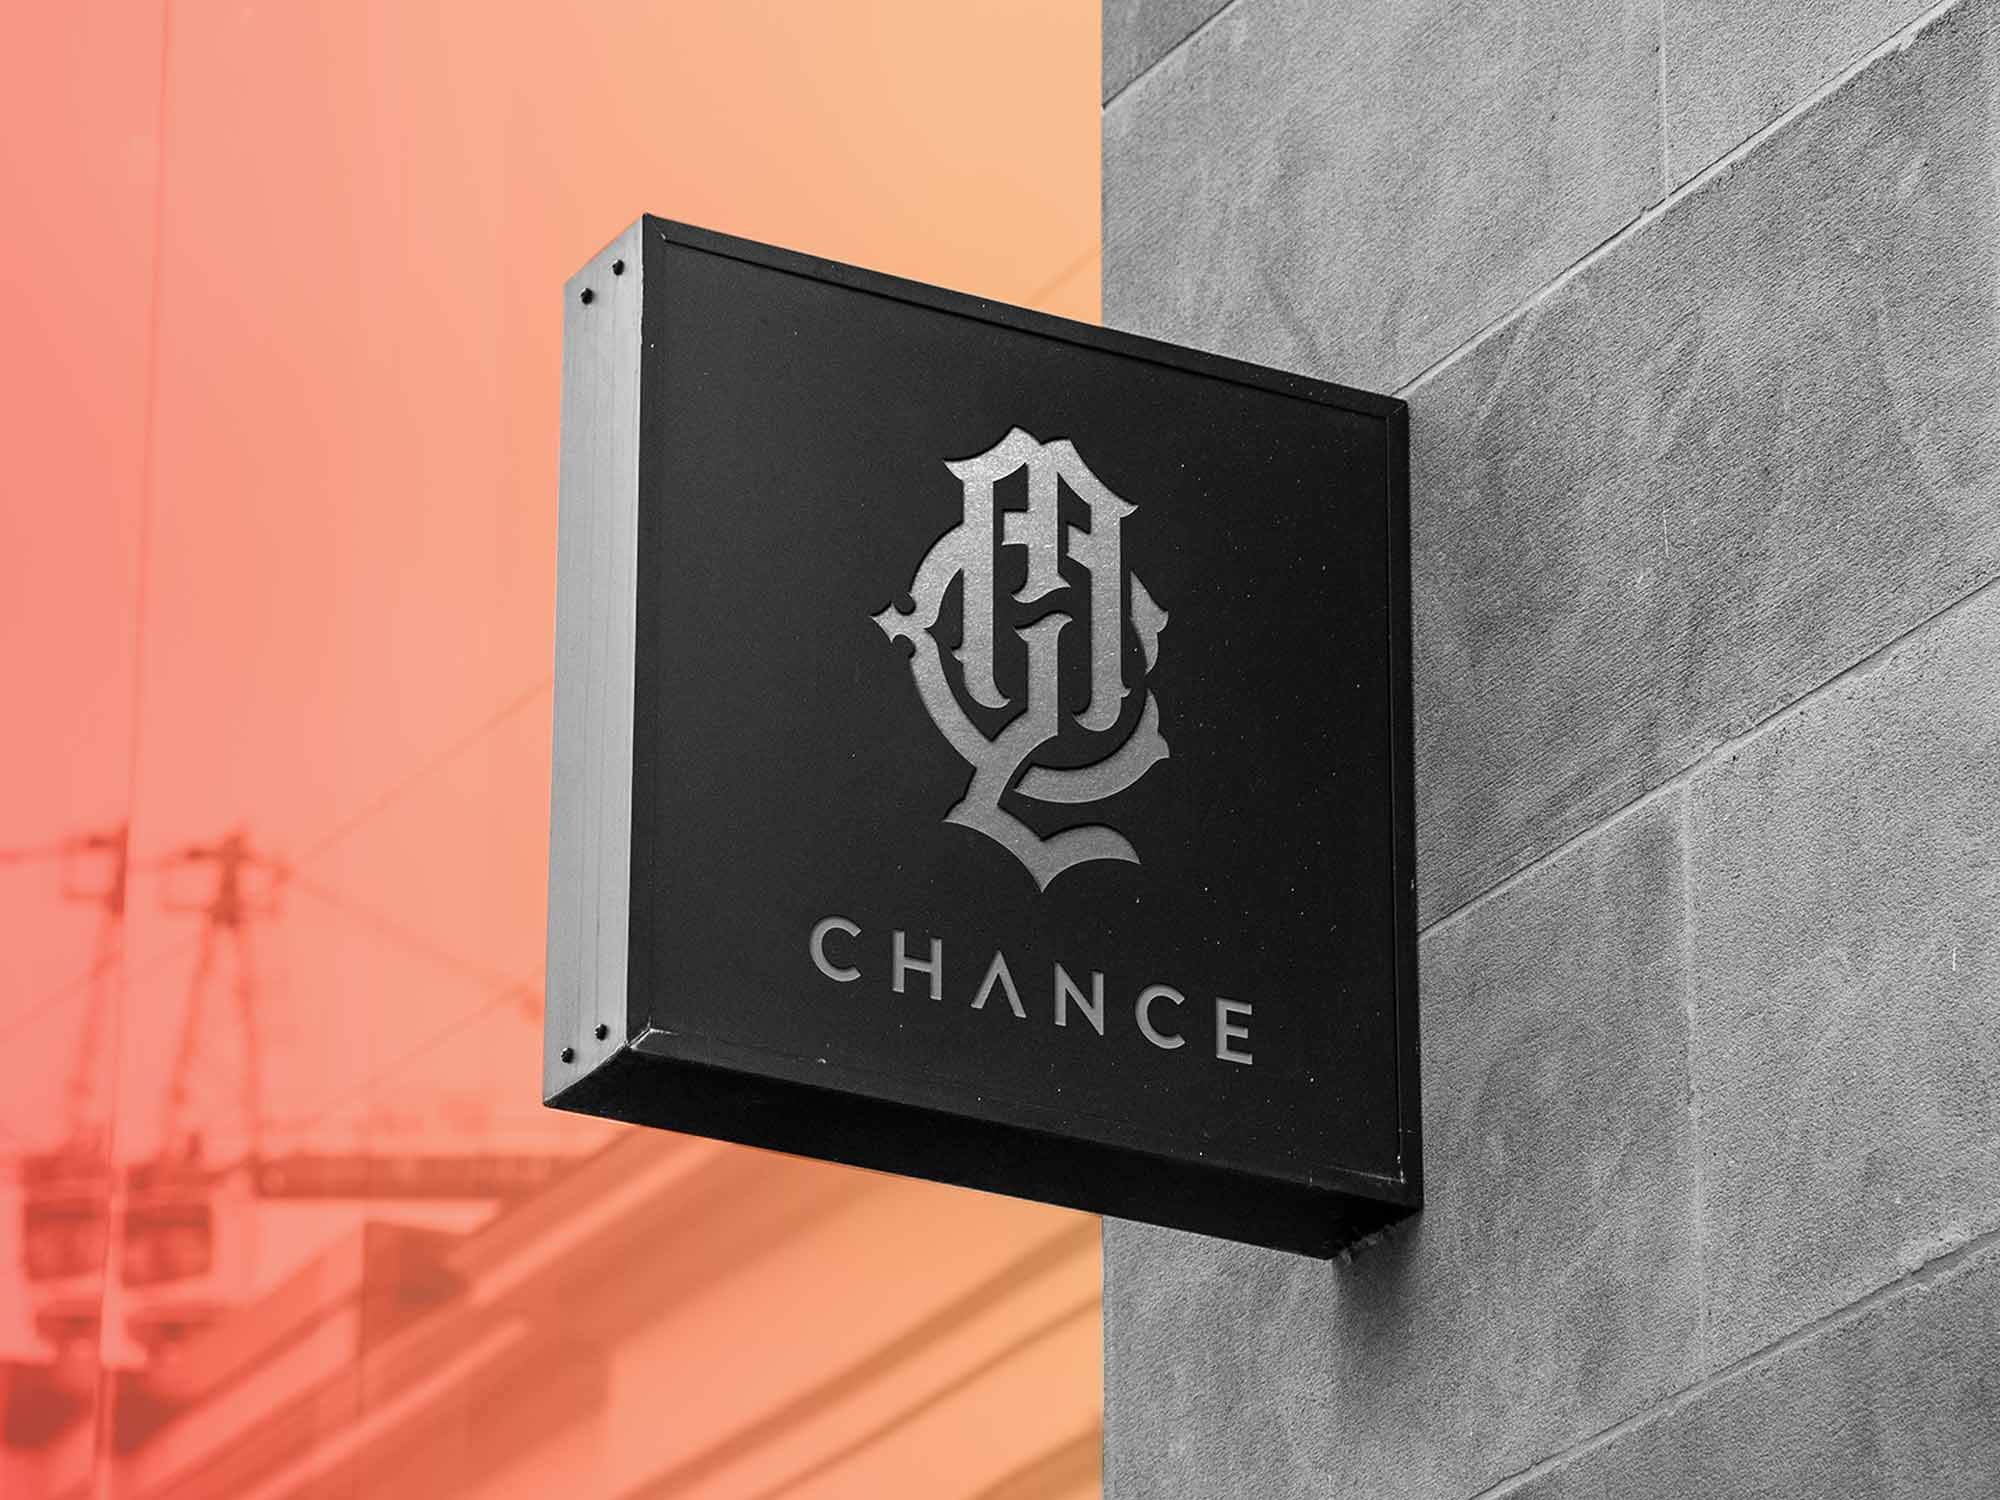 My Last Chance - Apparel Branding, shop sign